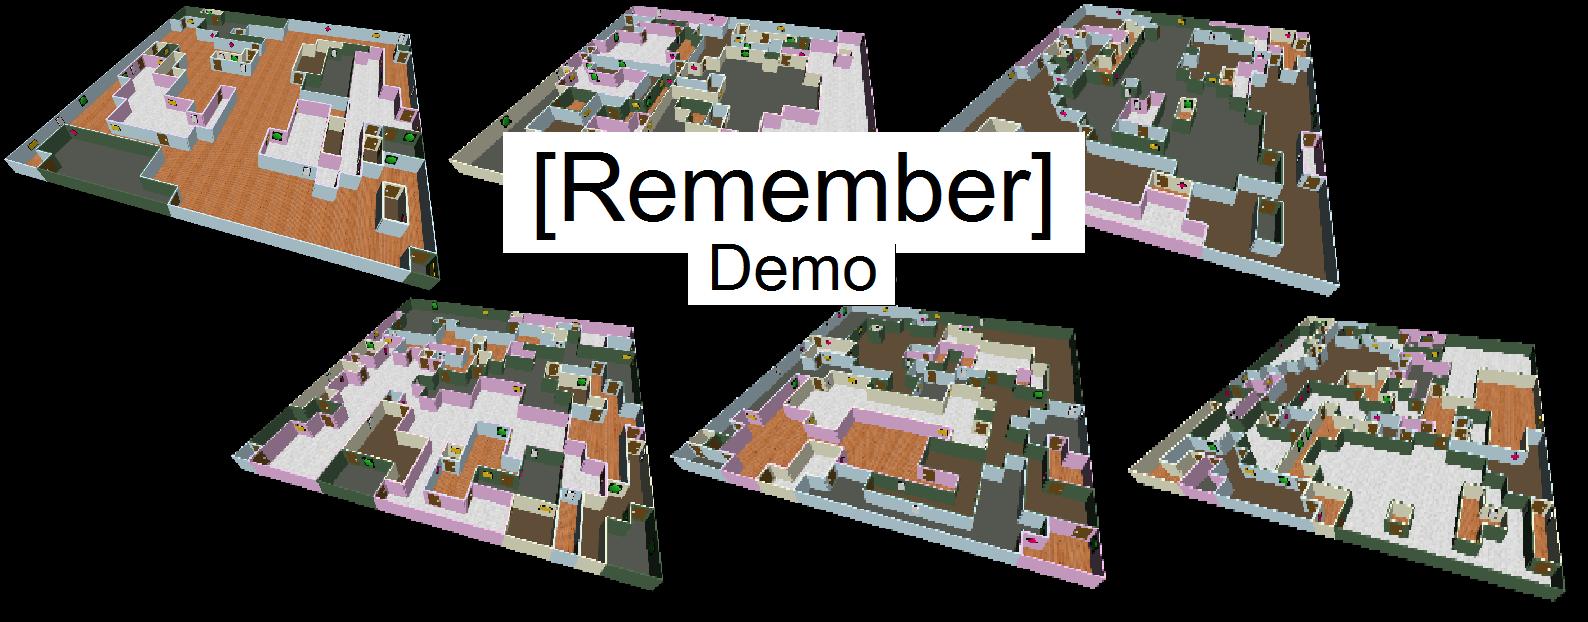 [Remember] - Demo